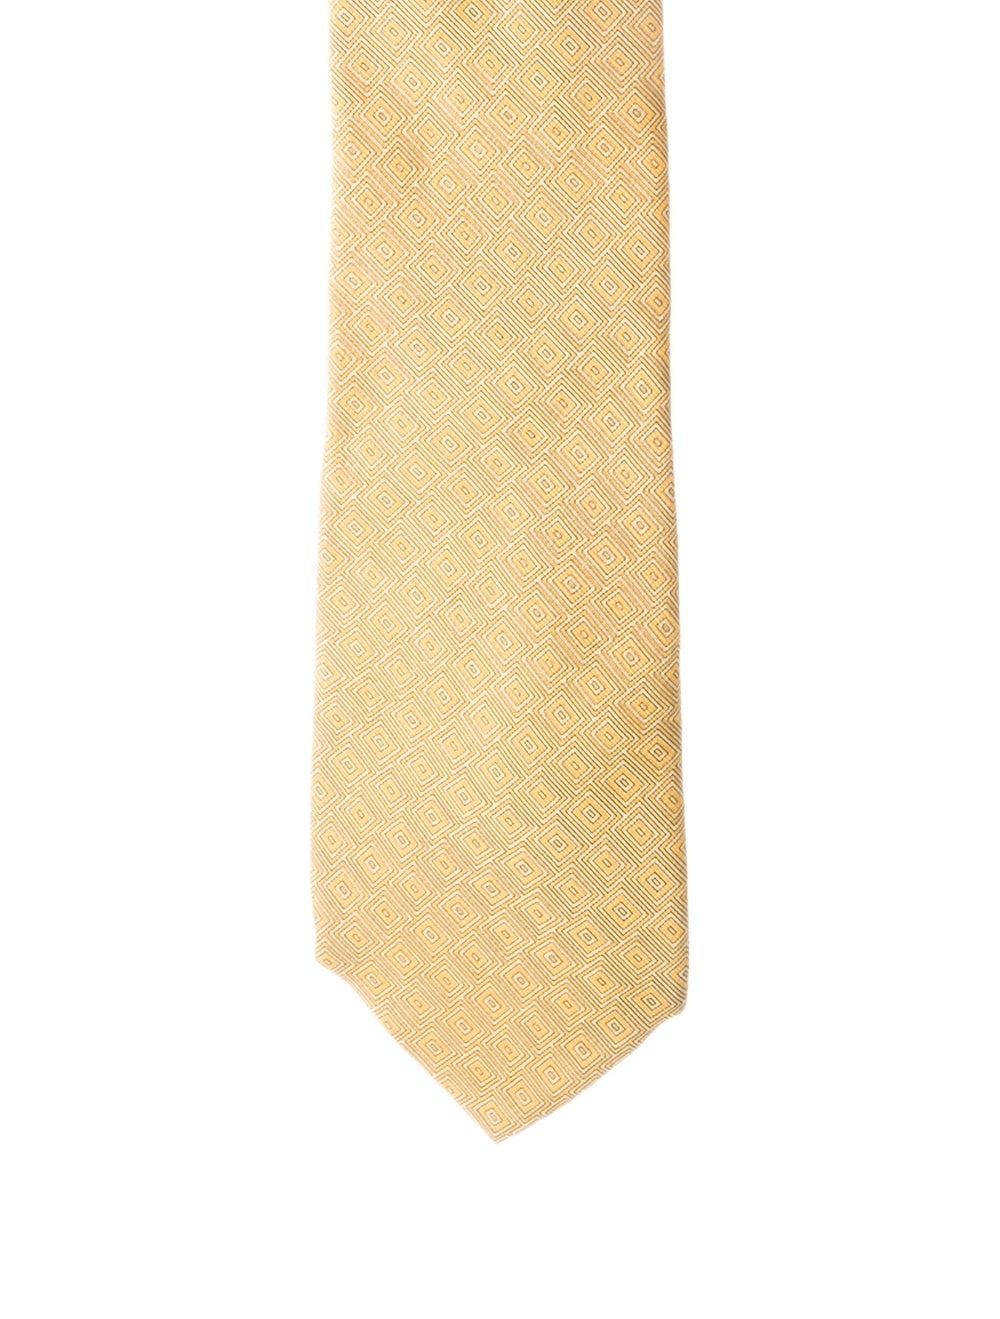 Gianni Versace Silk Printed Tie yellow - image 1